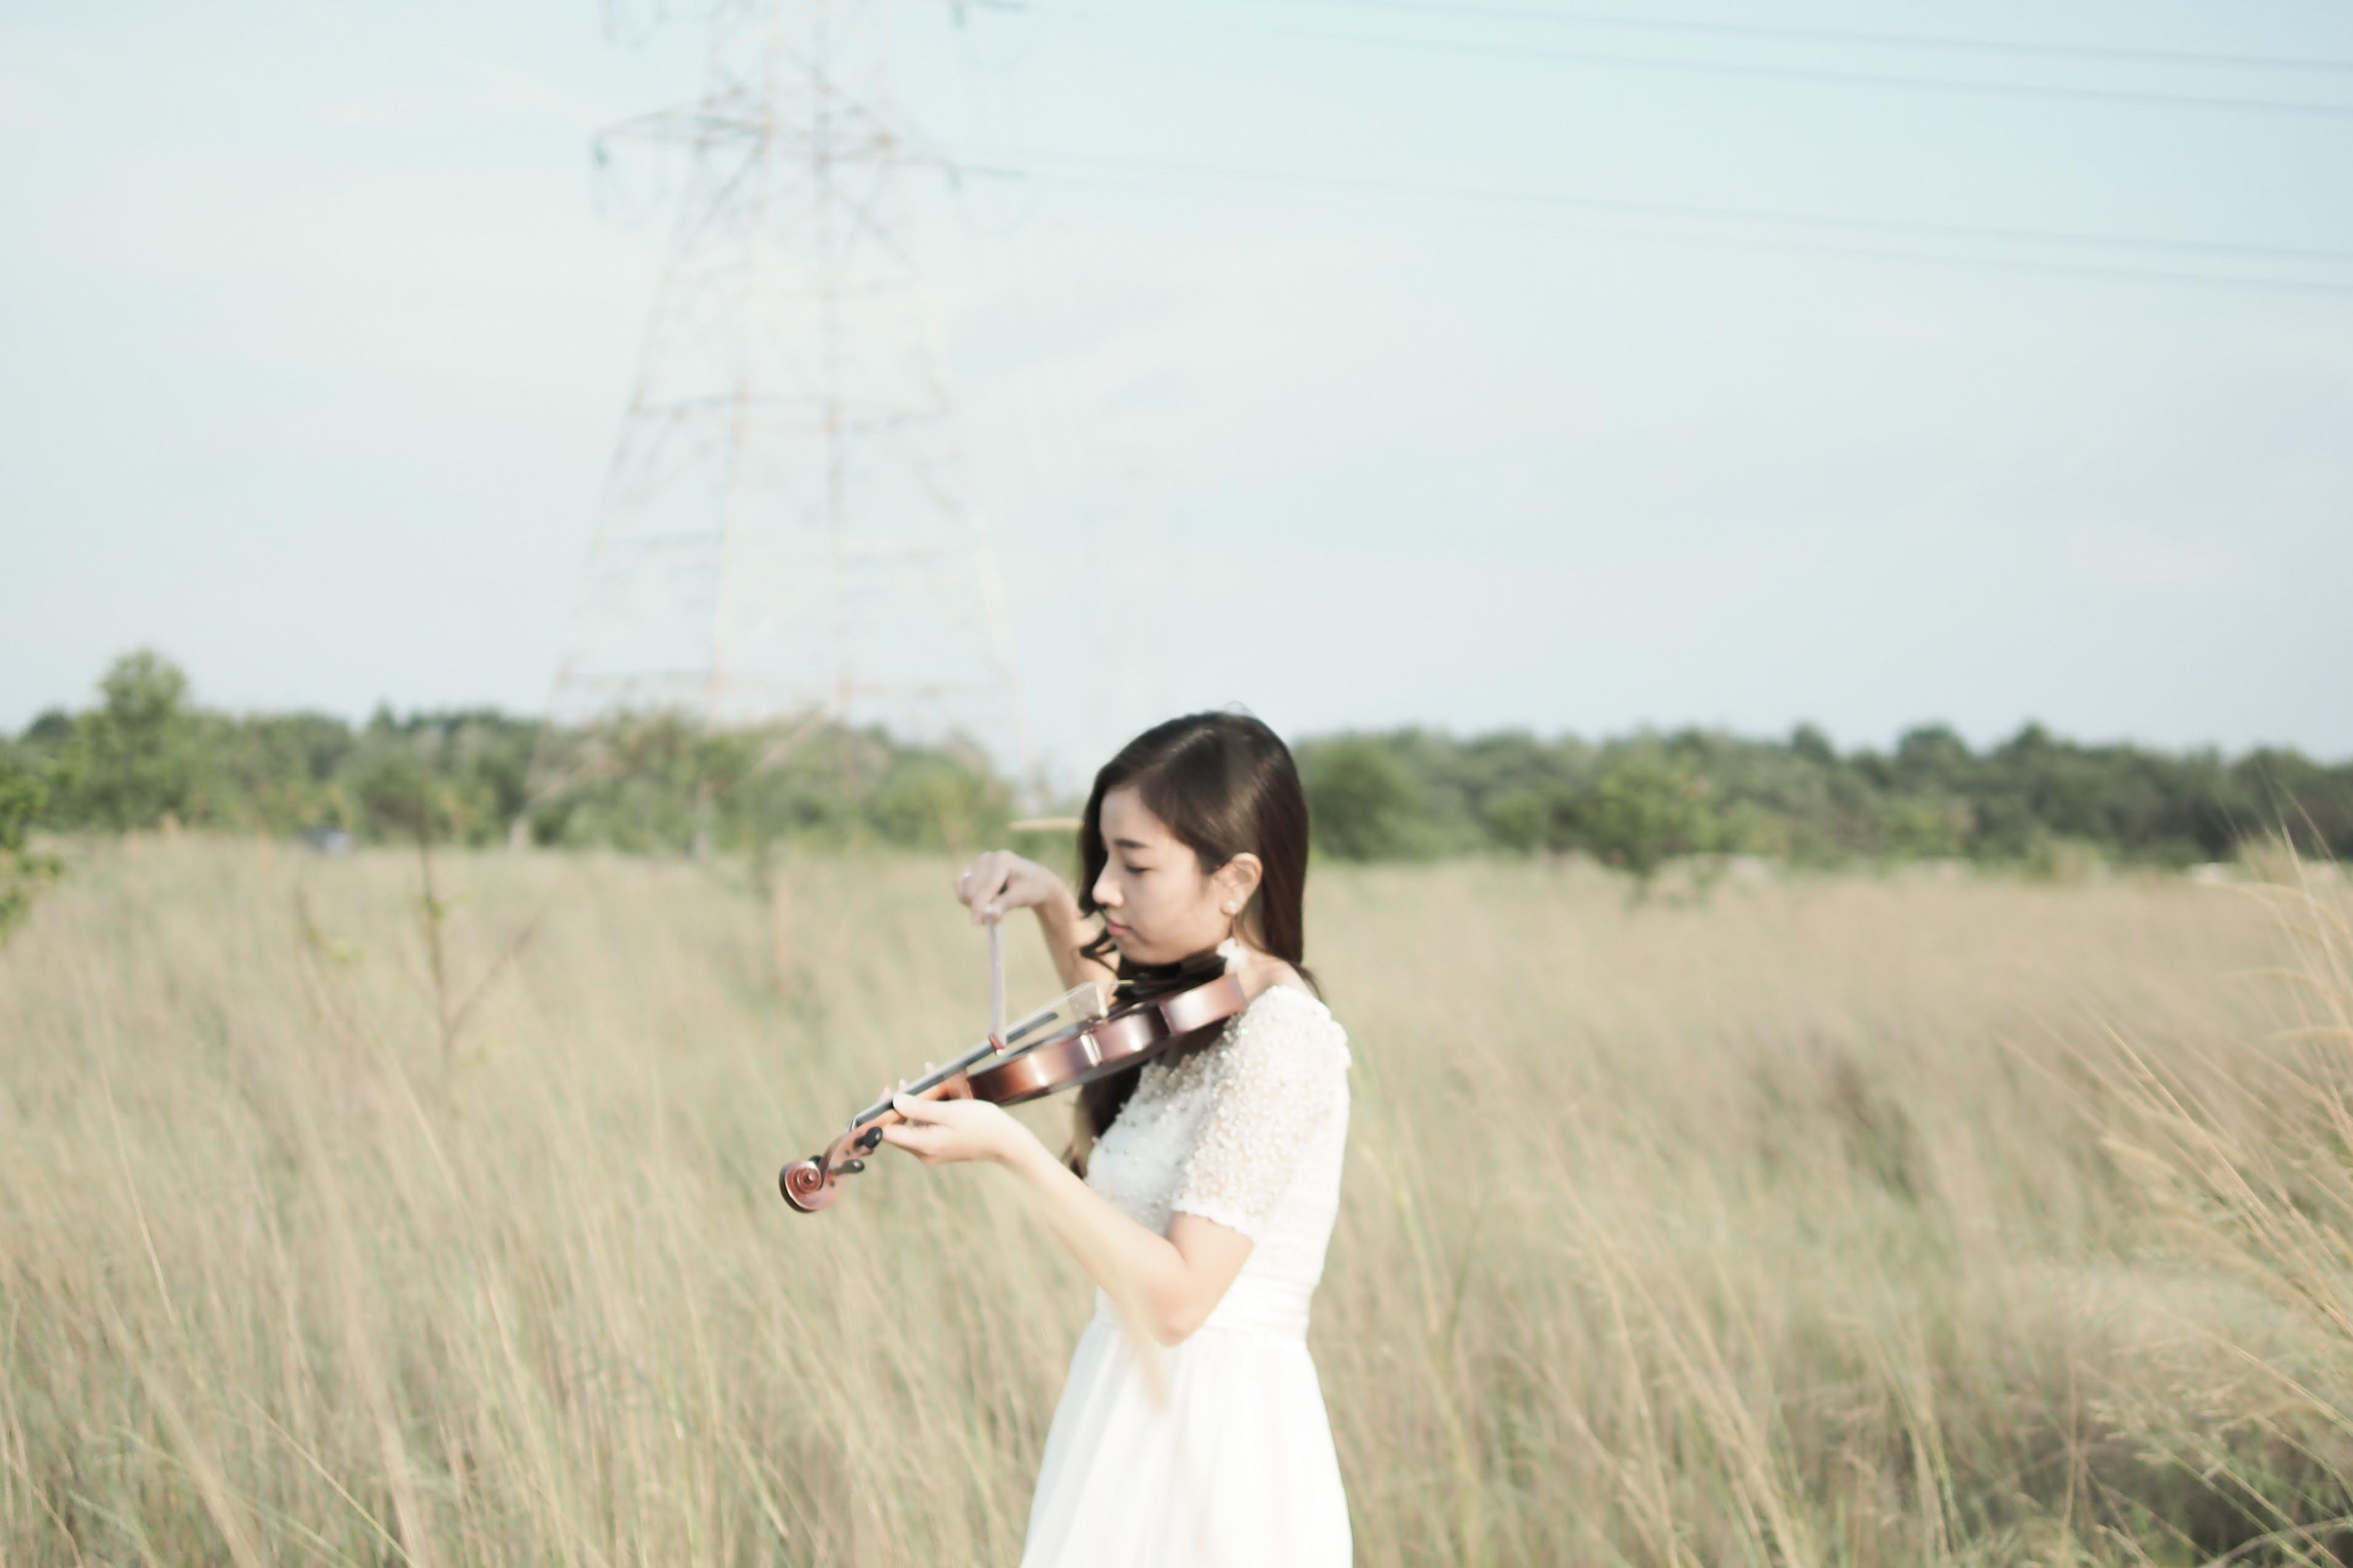 Woman Wearing White Dress Playing Violin